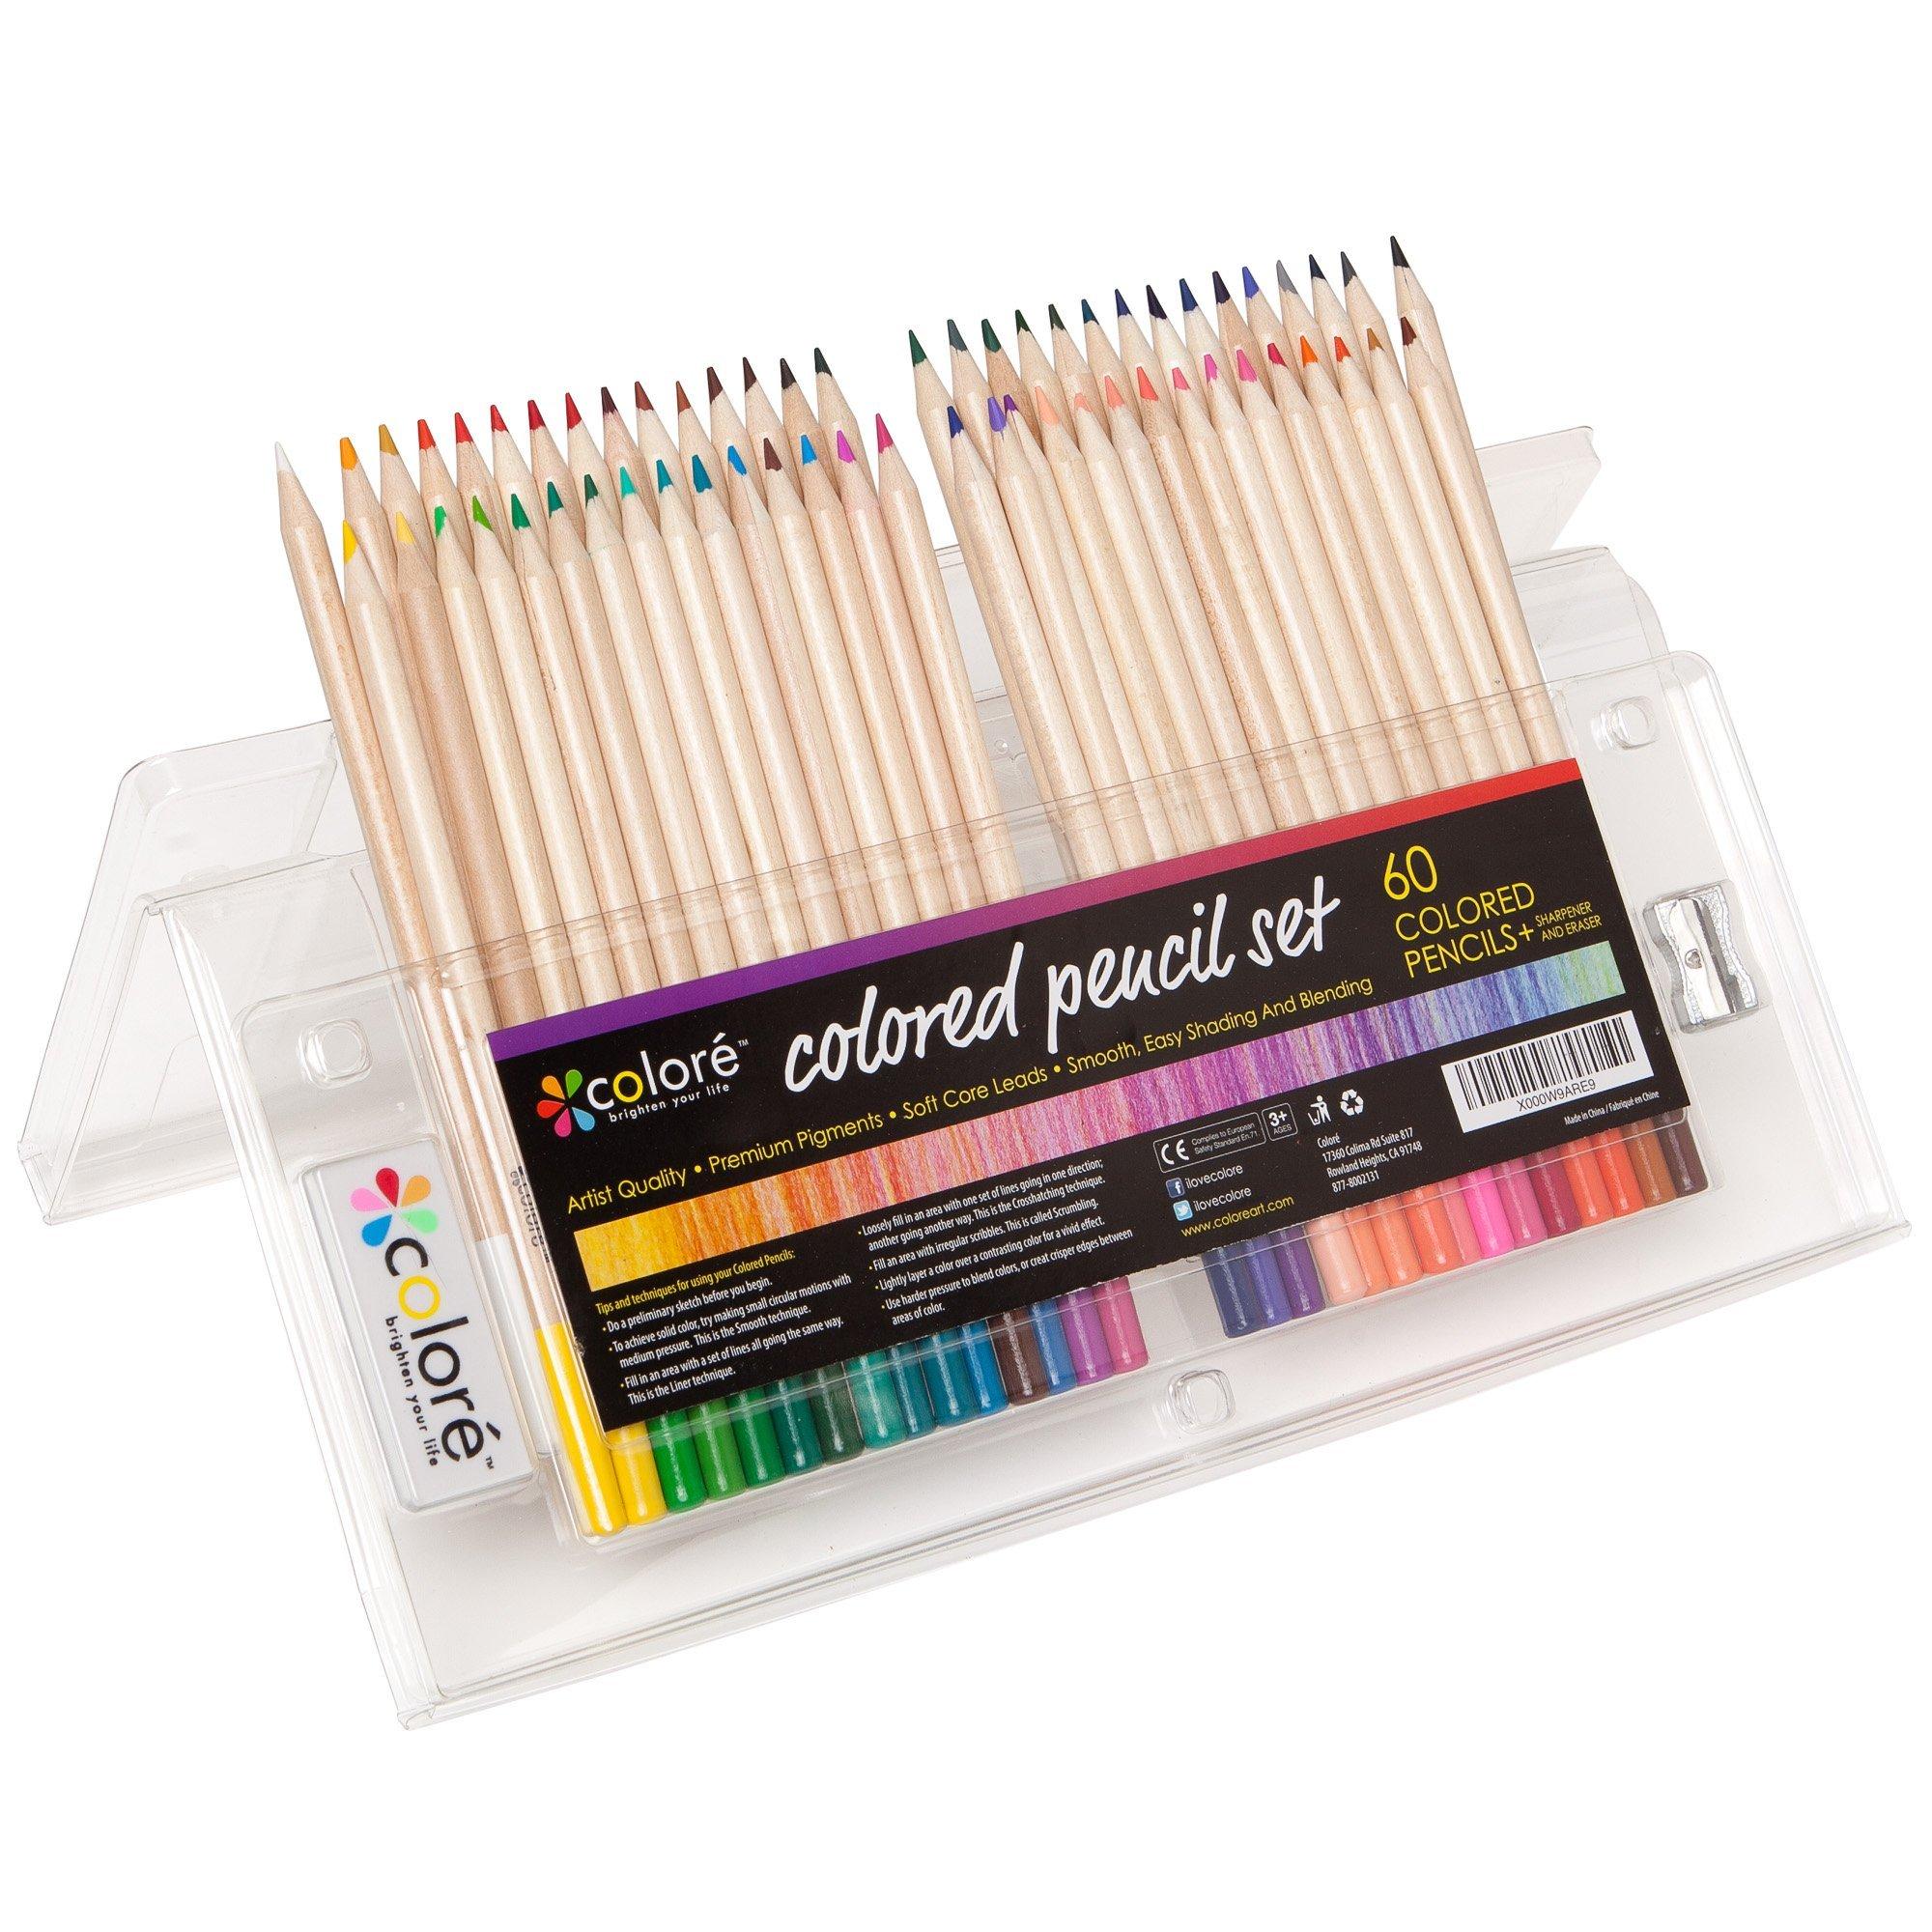 Cheap 500 Colored Pencils Find 500 Colored Pencils Deals On Line At - Premium-color-pencils